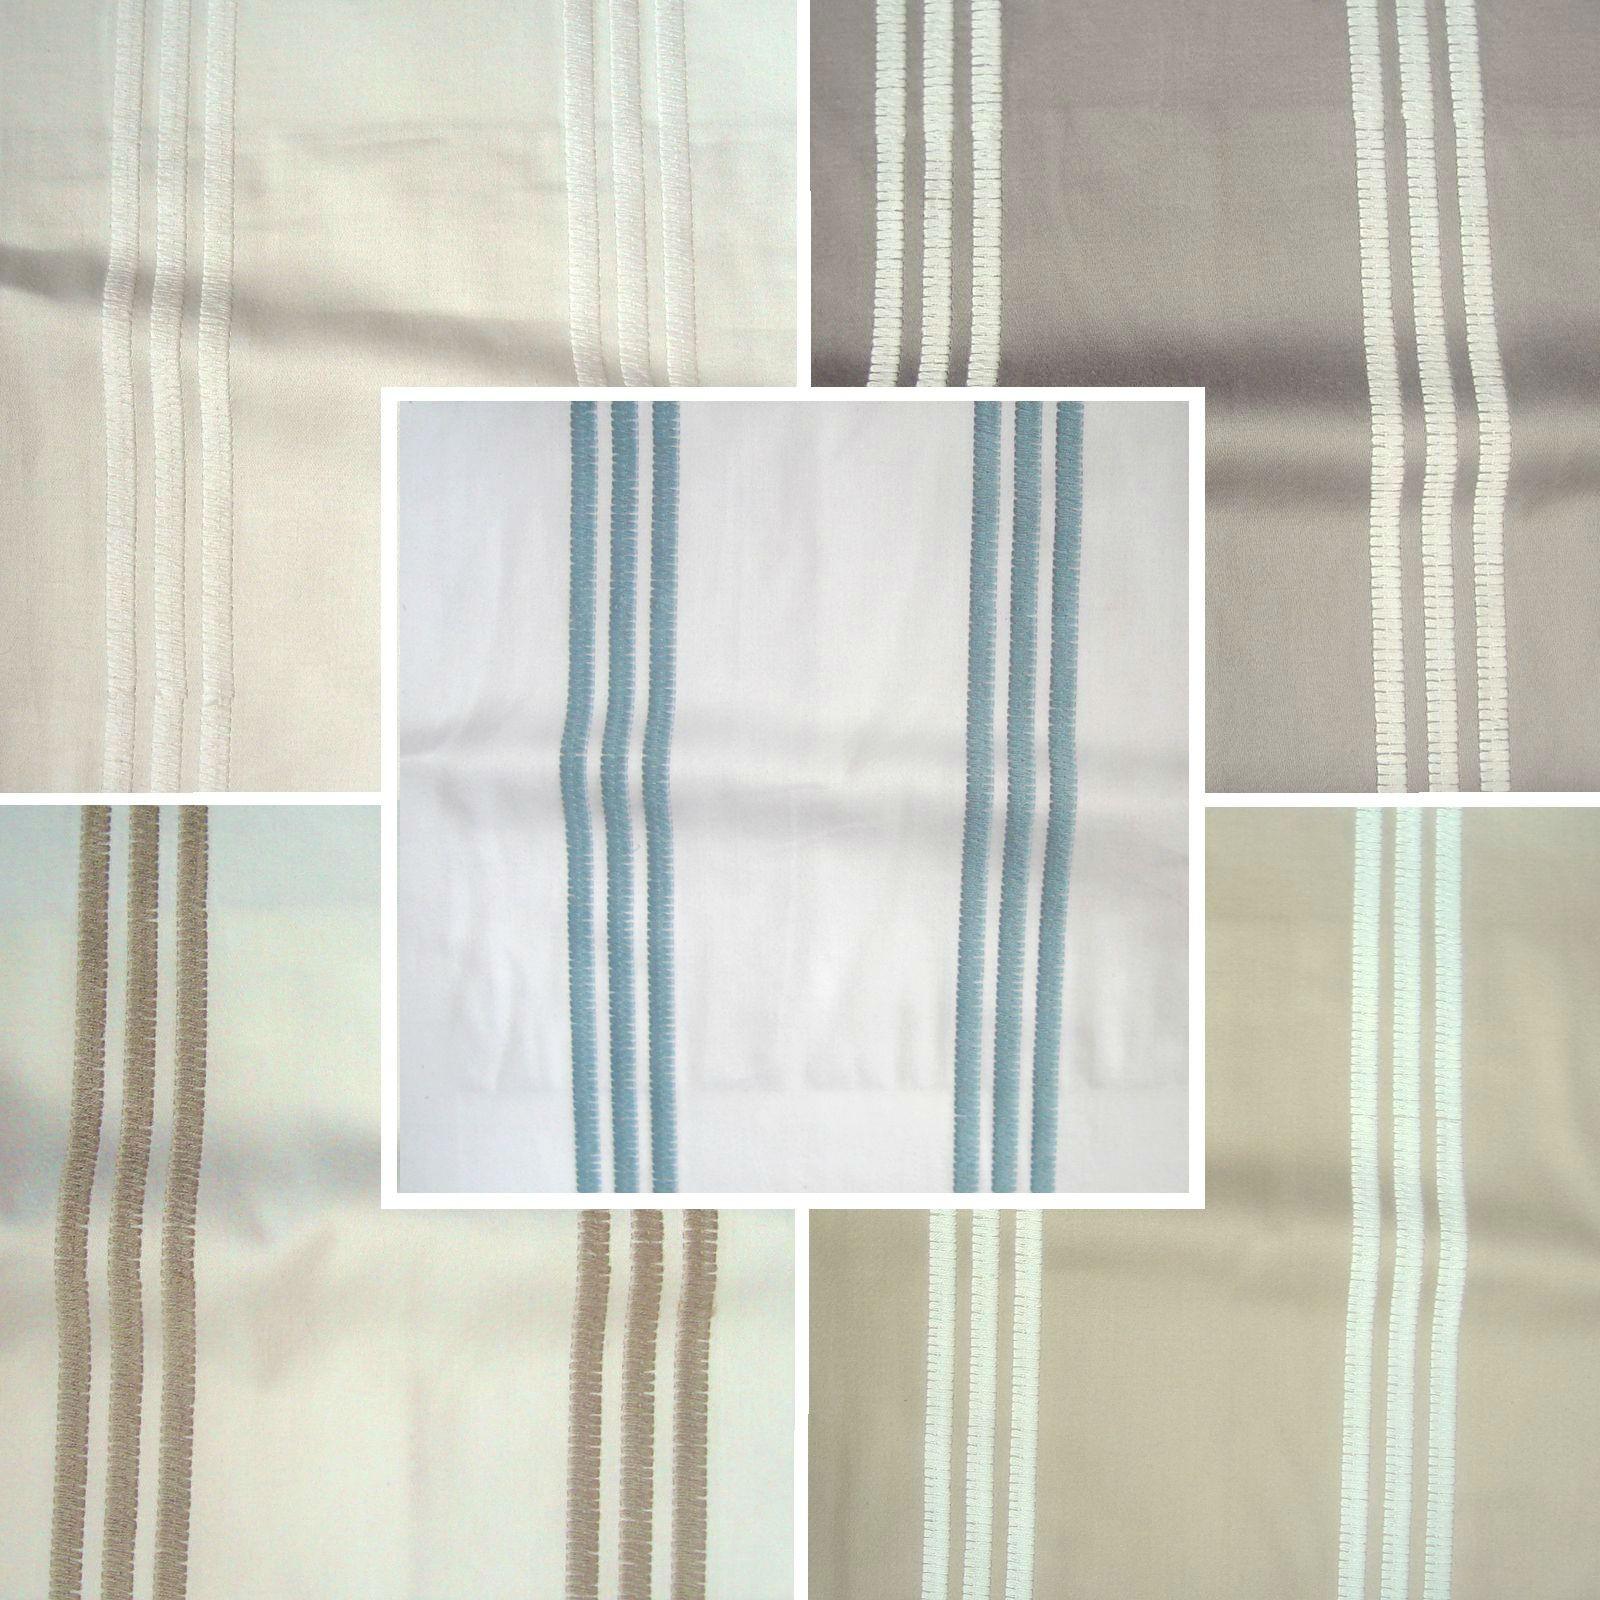 marley tissu rayure ashley wilde. Black Bedroom Furniture Sets. Home Design Ideas